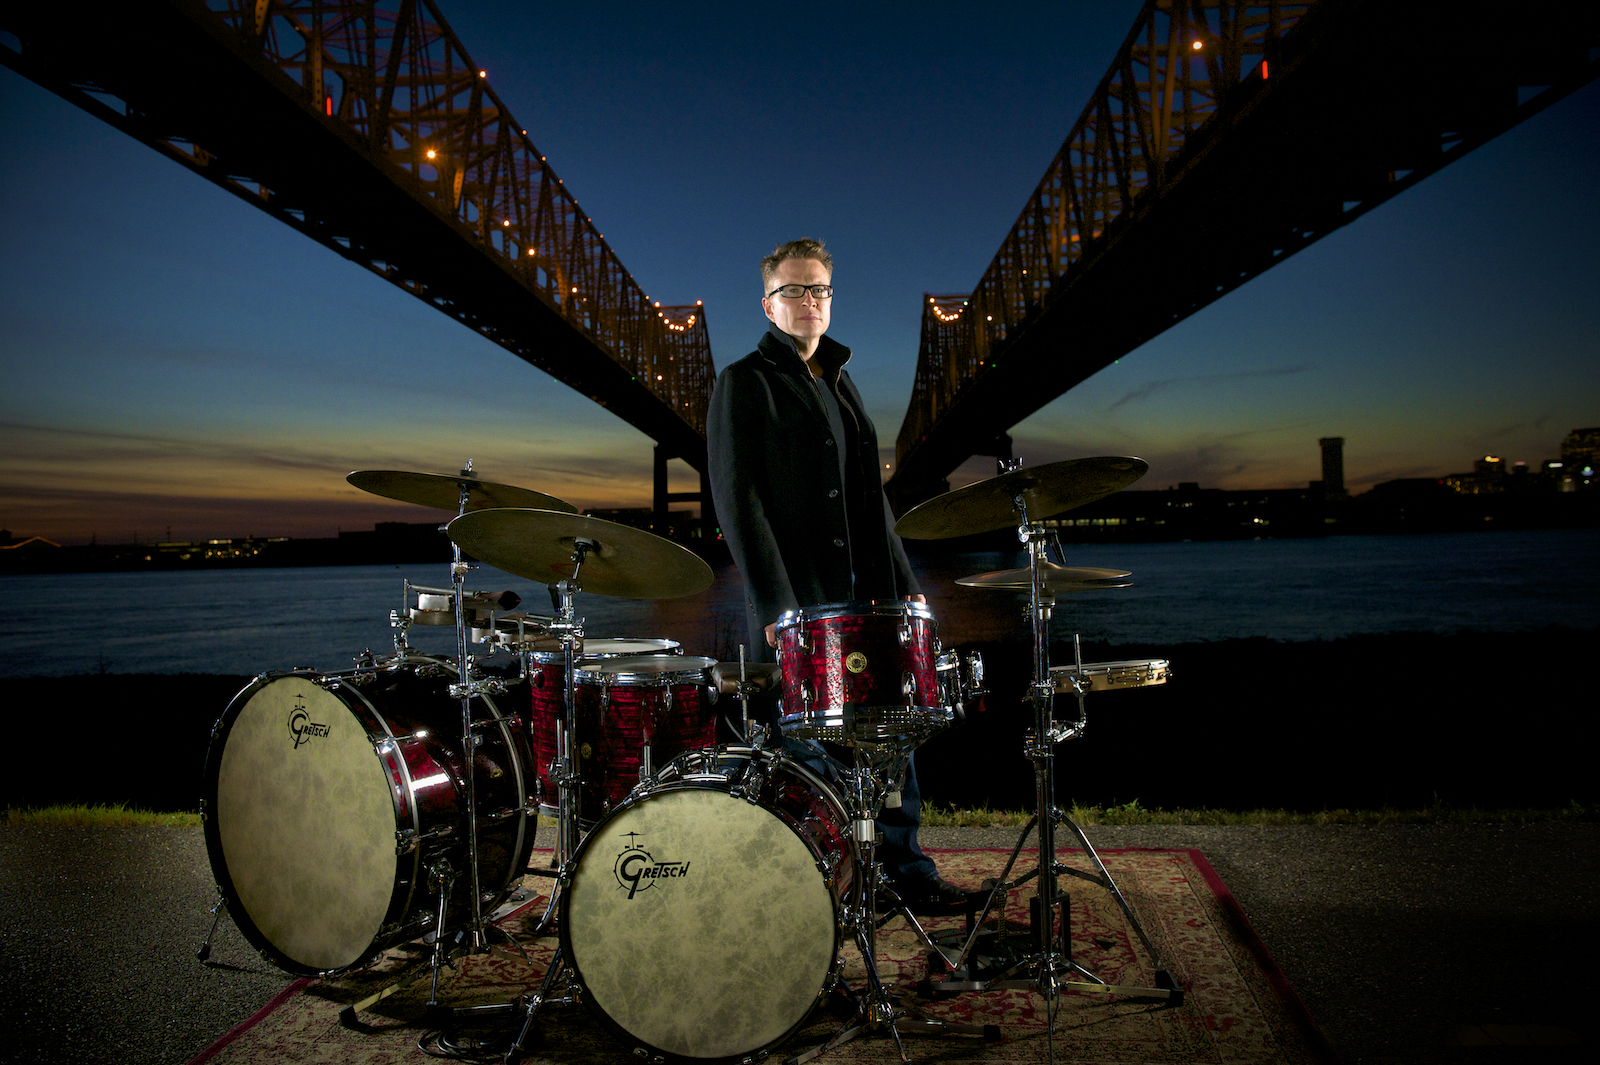 Galactic and Stanton Moore Trio drummer Stanton Moore